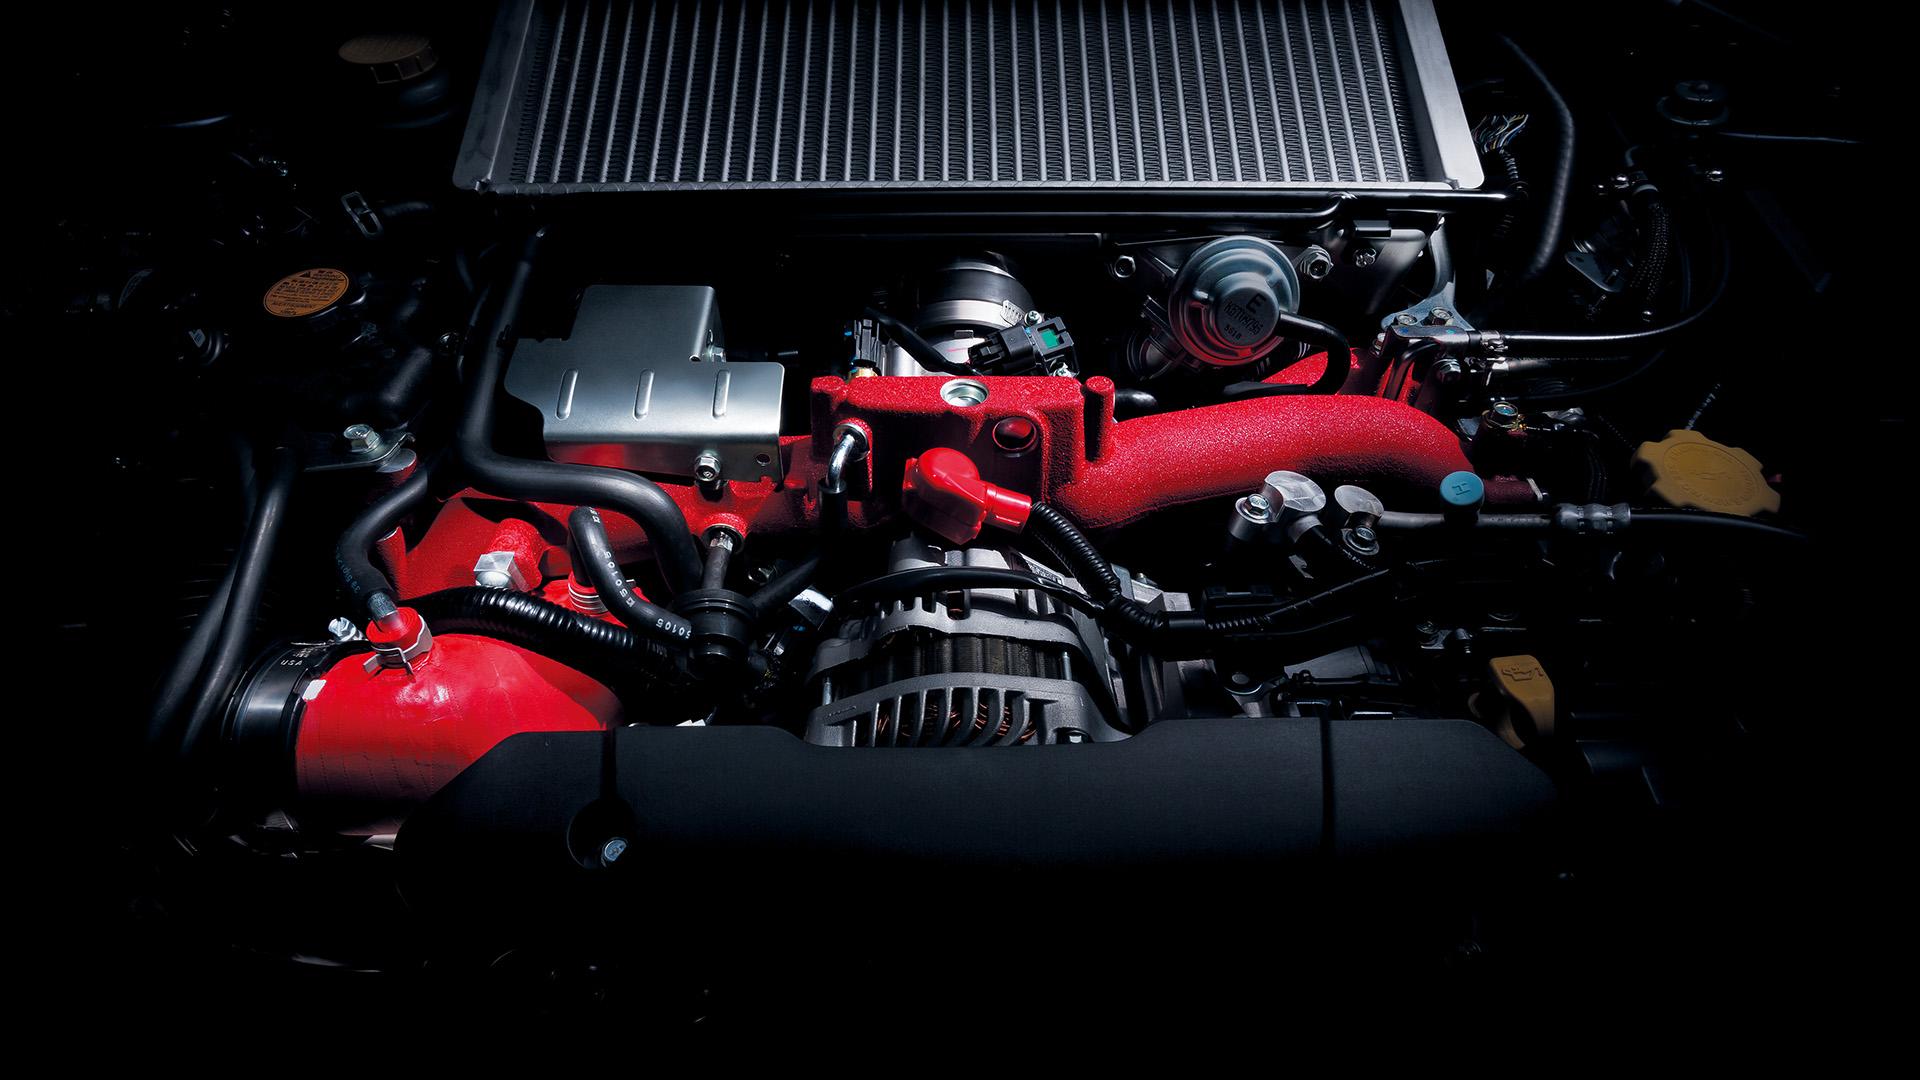 subaru wrx sti s207 moteur 2 0l boxer 4 cylindres 328 ch. Black Bedroom Furniture Sets. Home Design Ideas